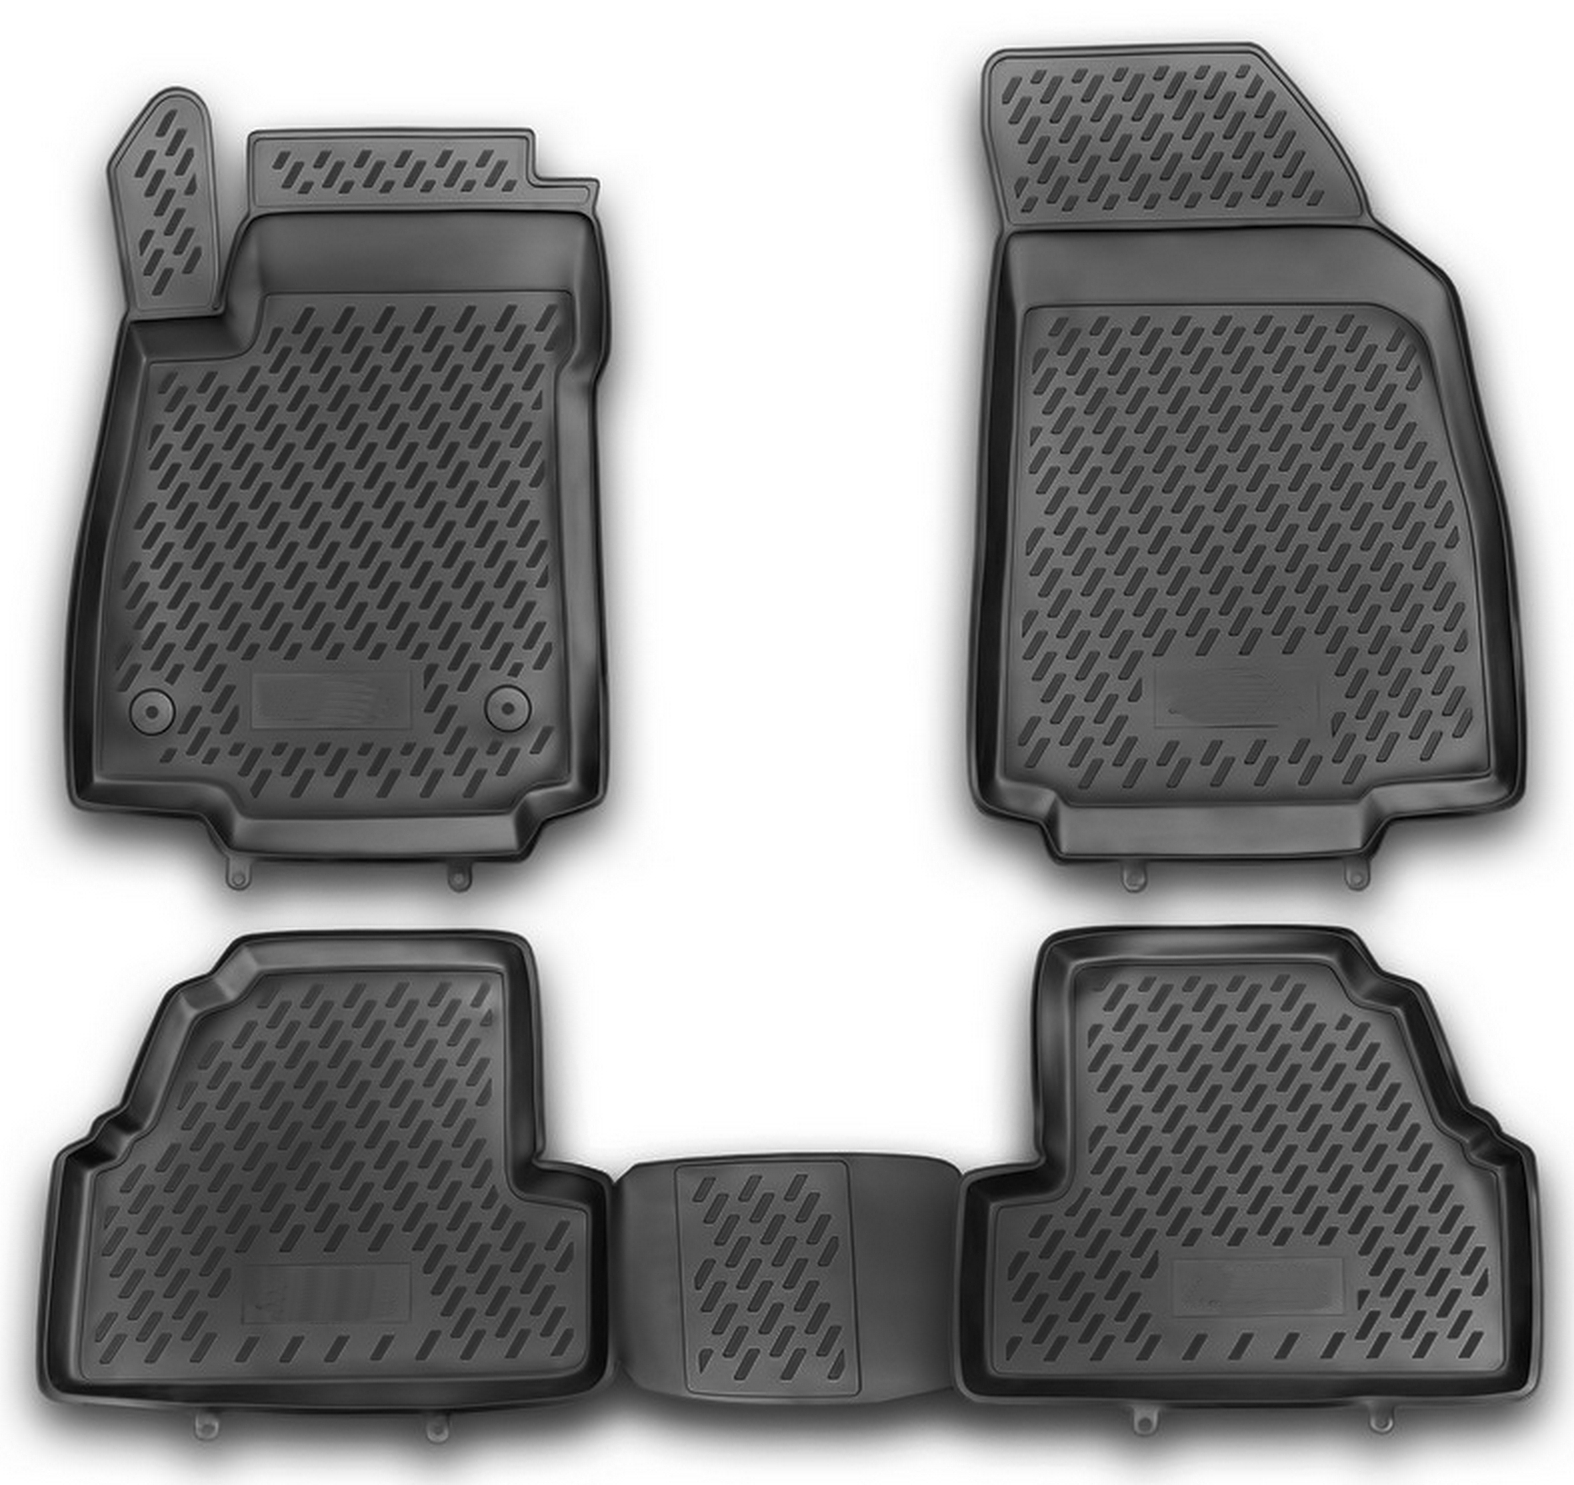 Opel Mokka 2012 Gummimatten Gummi Fußmatten 5-teilig 3D Schalen Passform